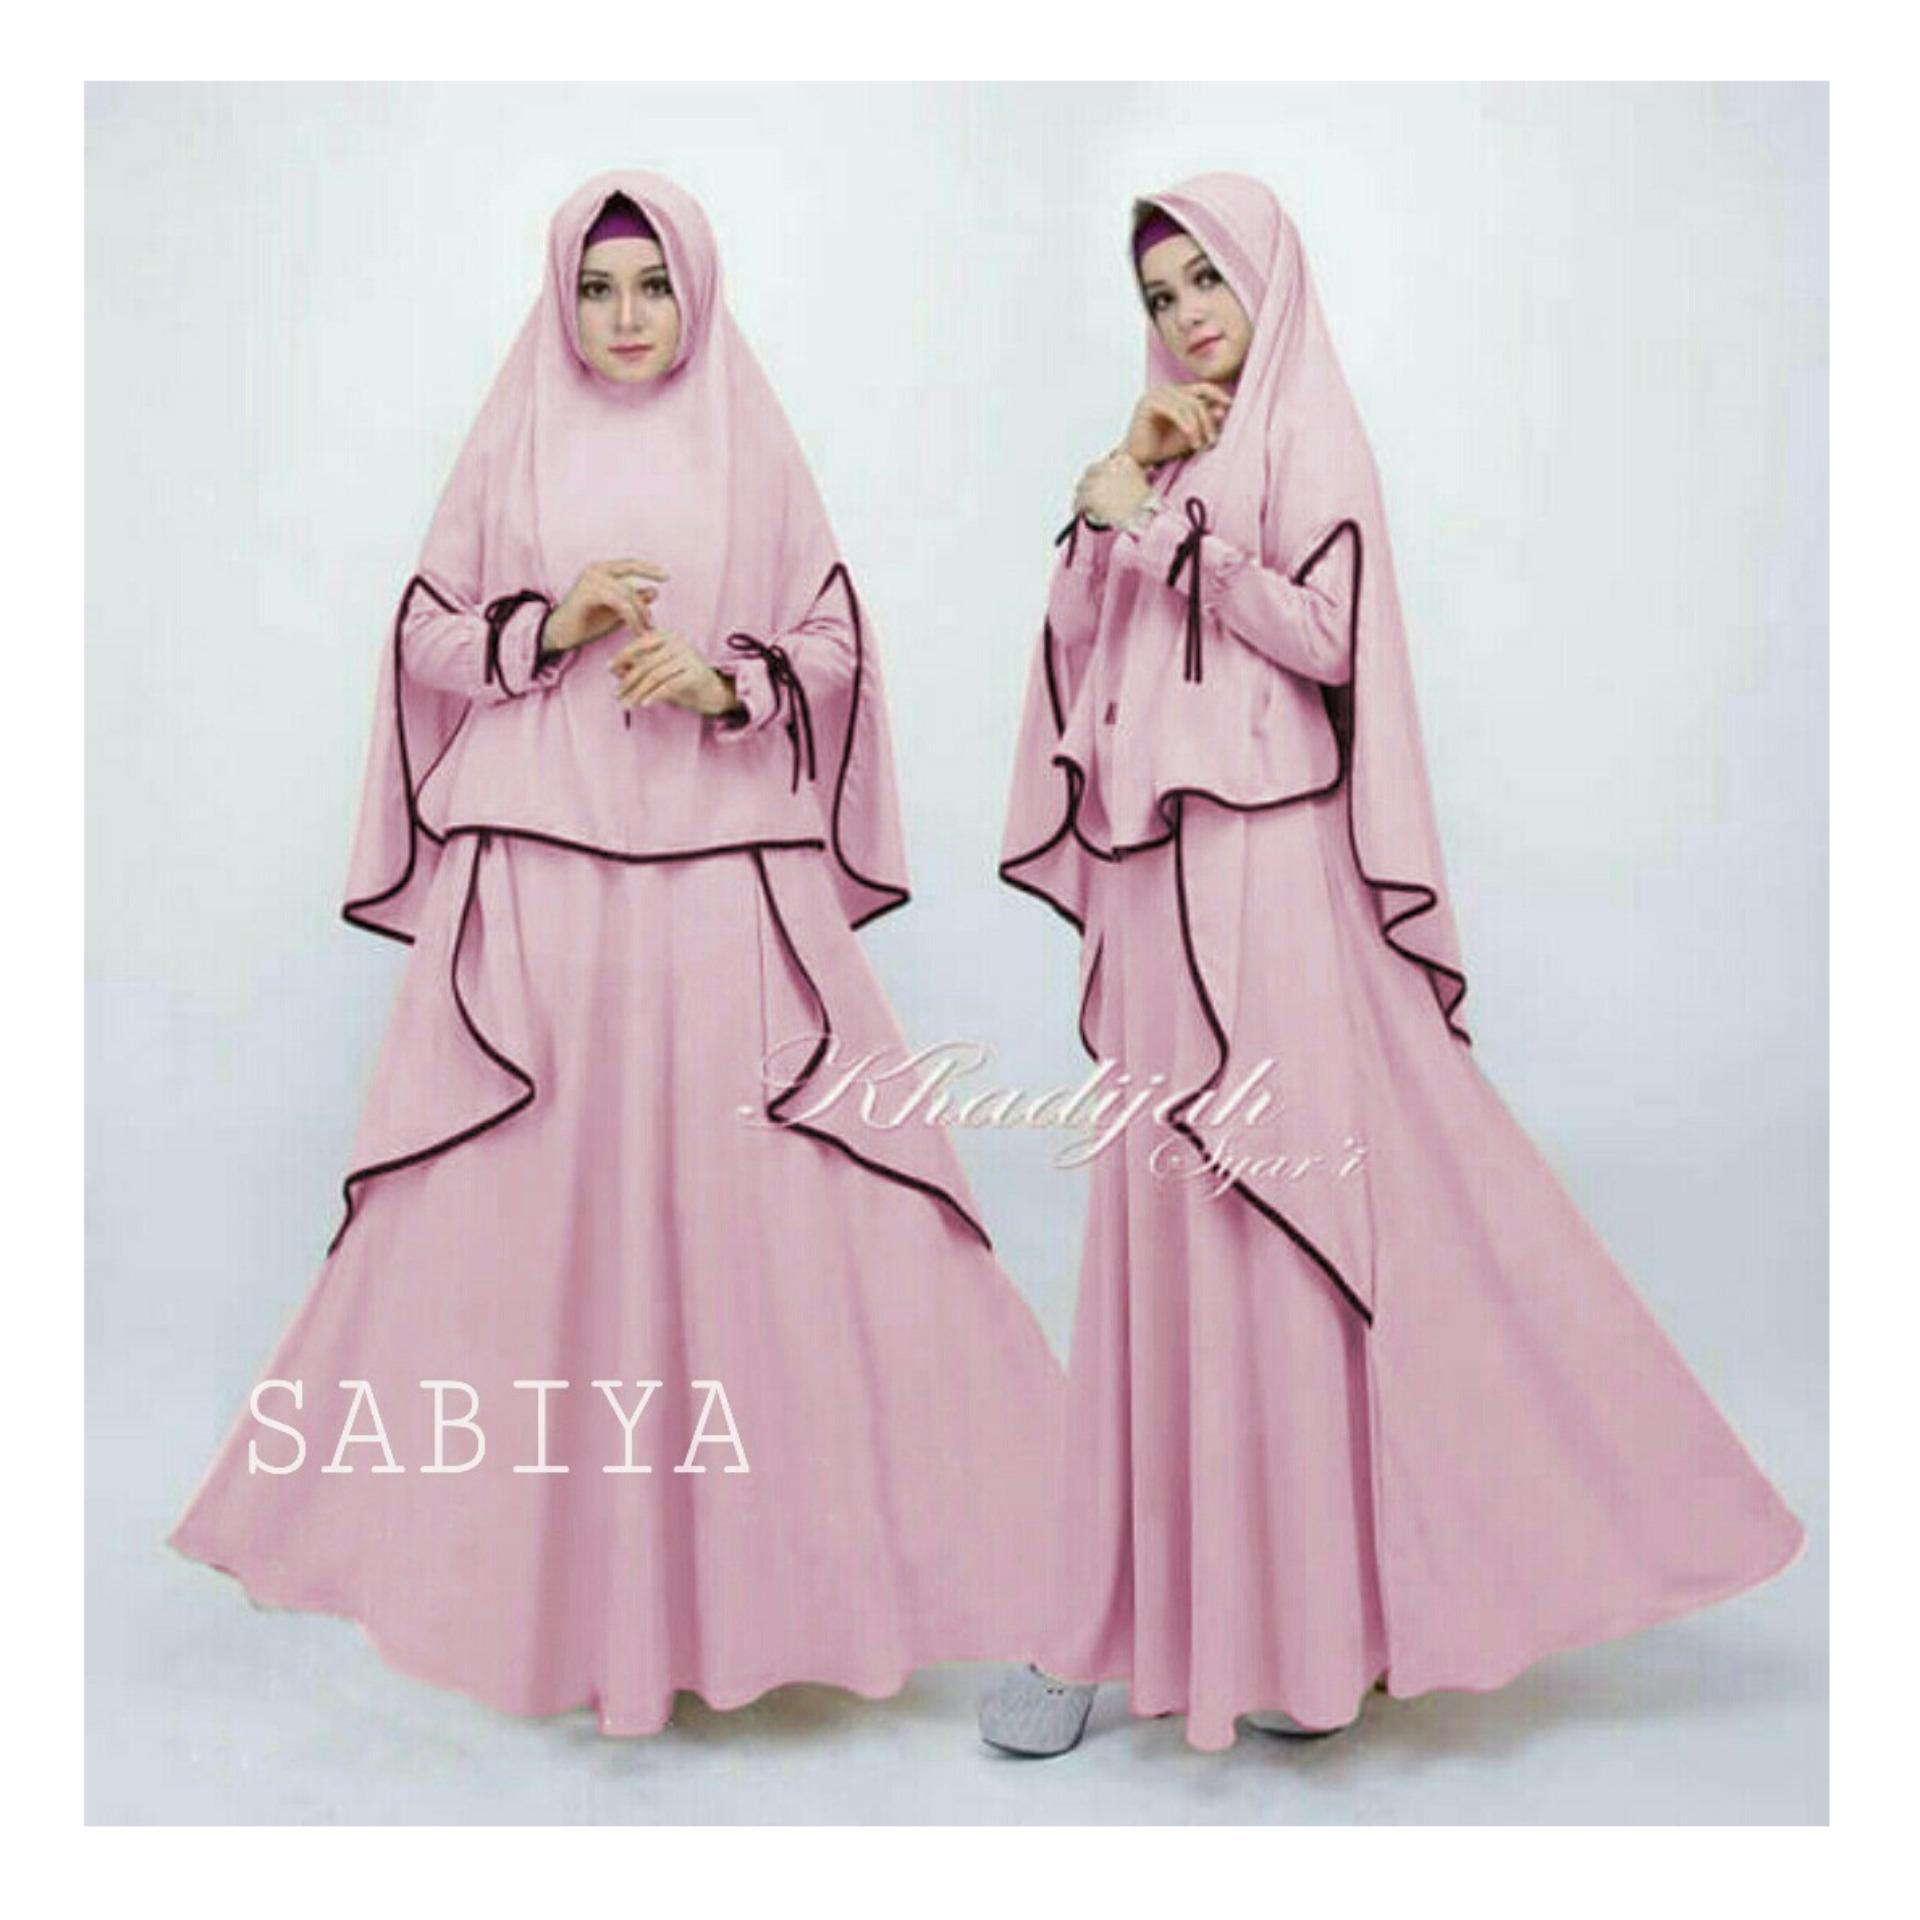 Premierfashionstore Sabiya Syari'i - Pink Dusty